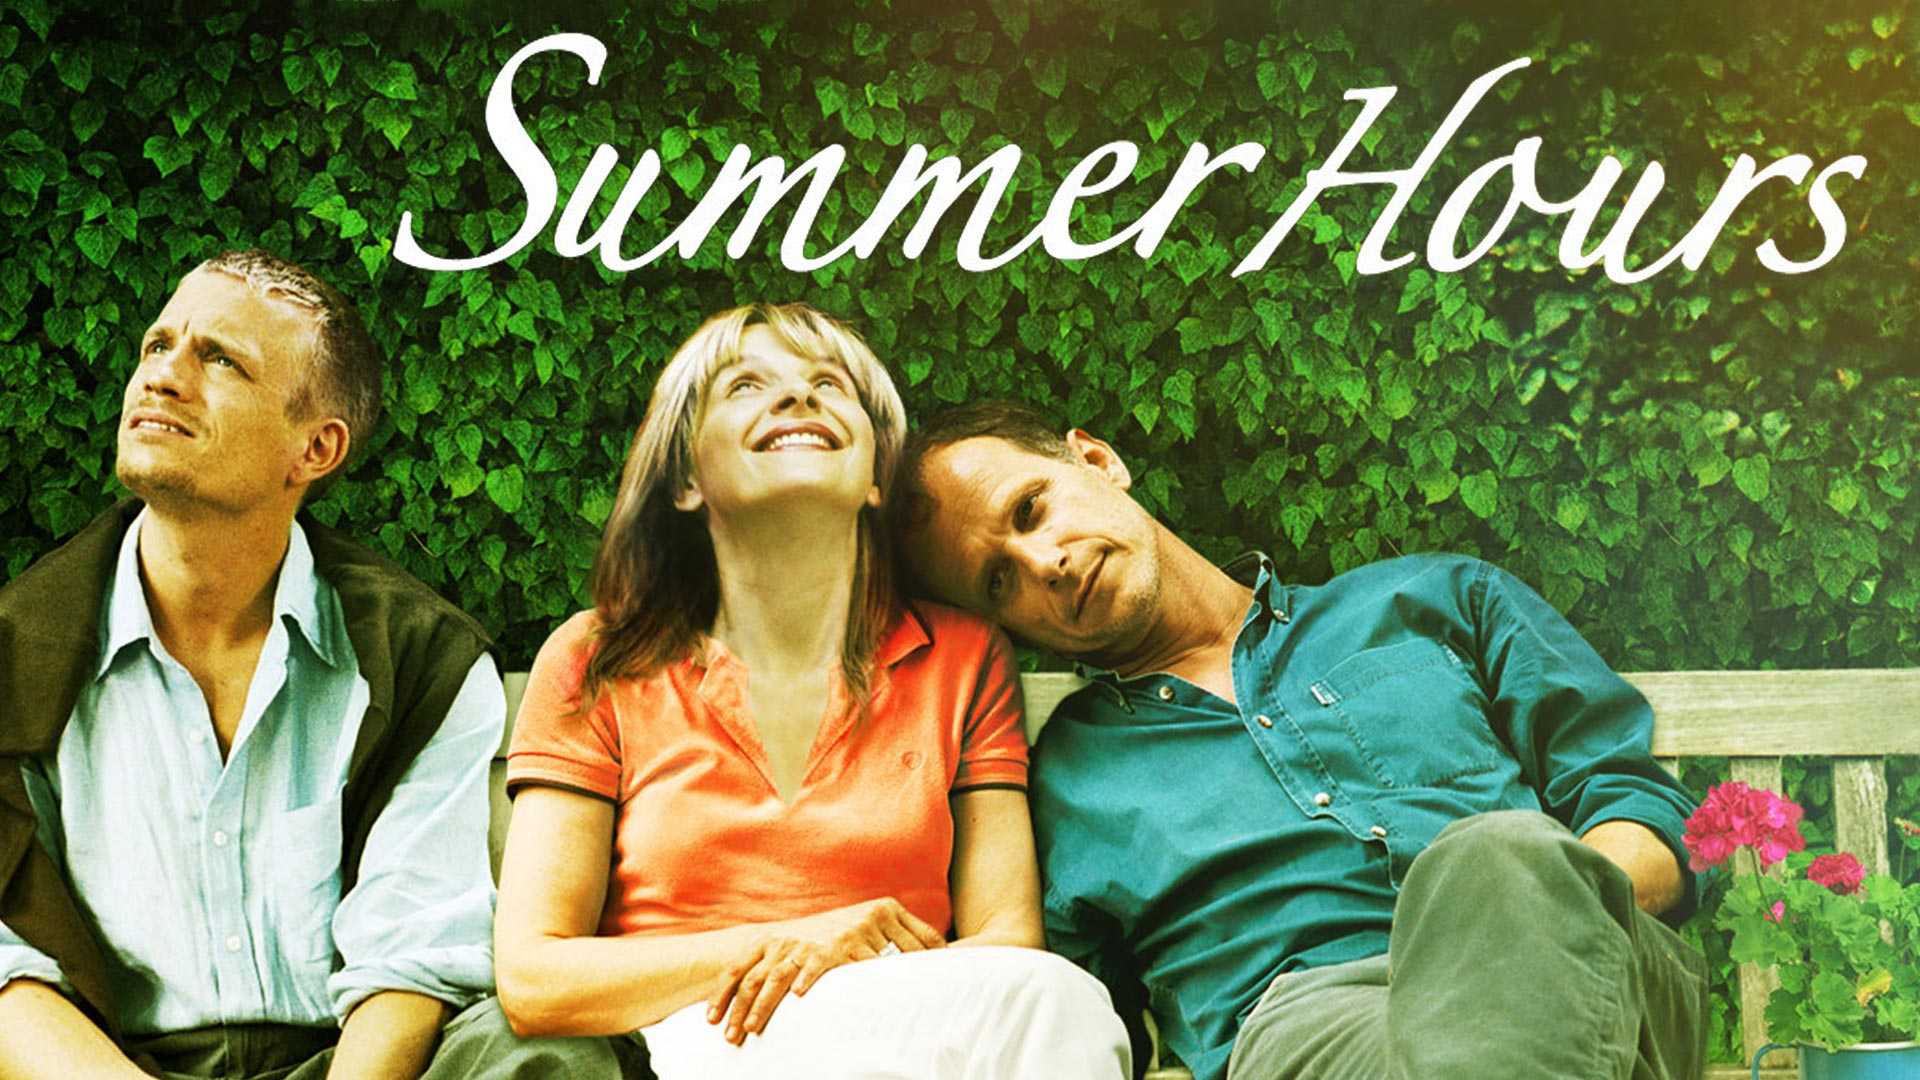 Summer Hours (English Subtitled)